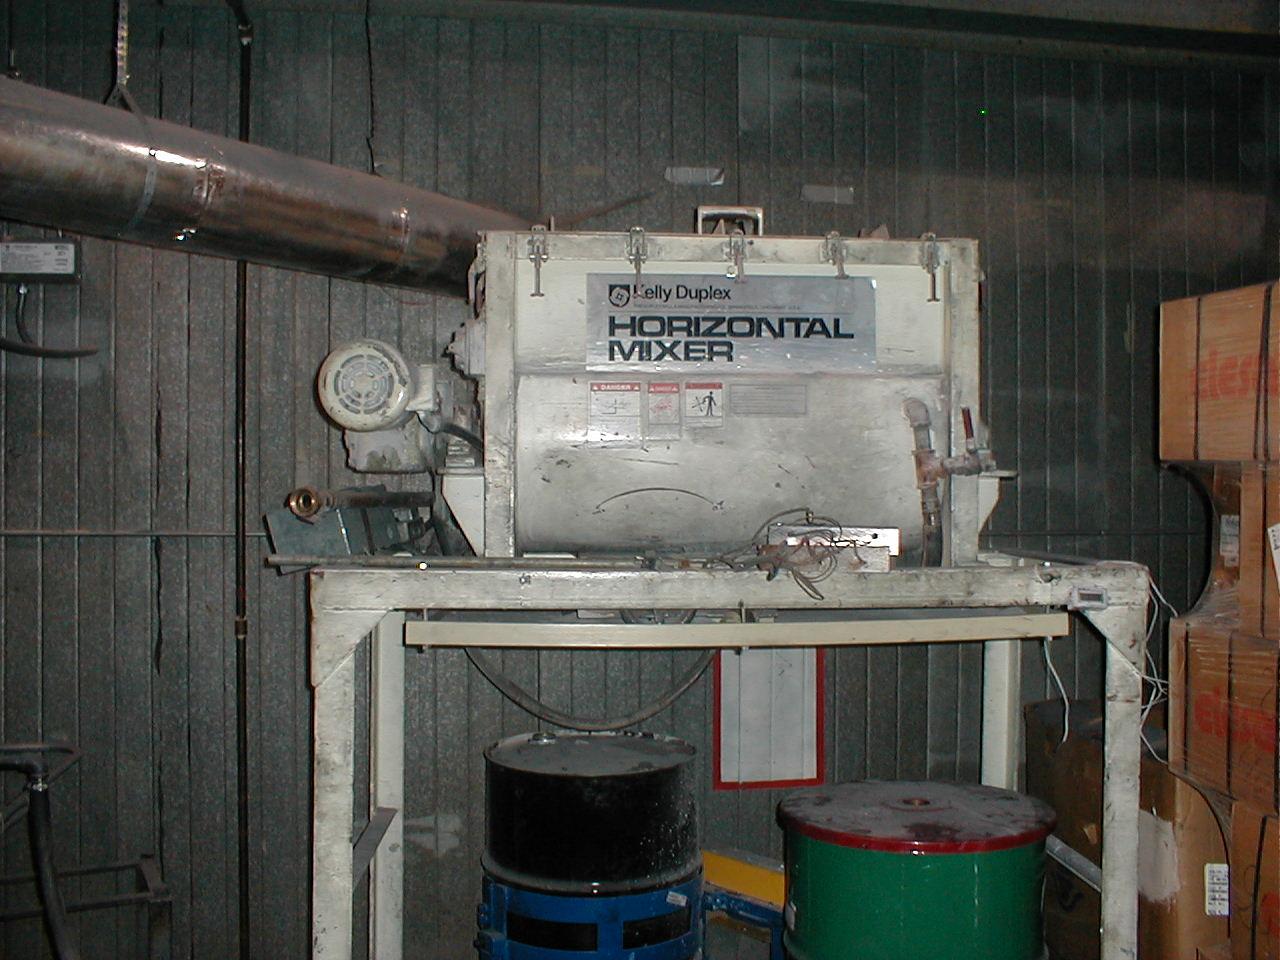 9 Cubic Foot Kelly Duplex Carbon Steel Horizontal Paddle Mixer